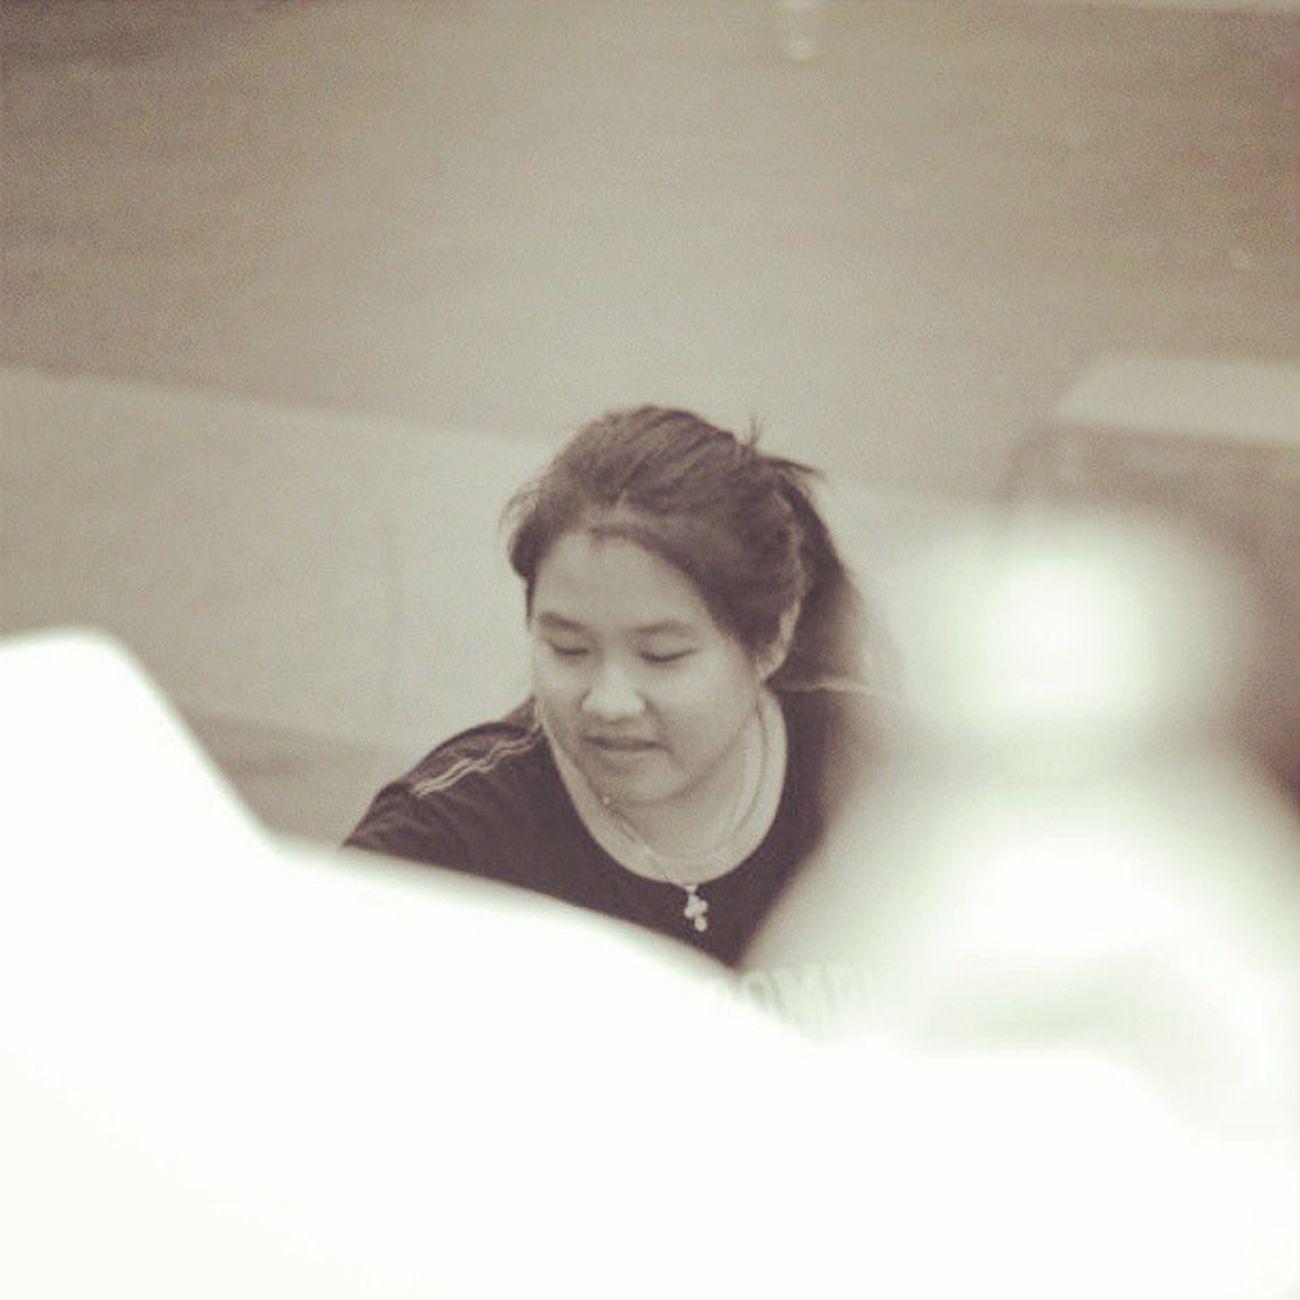 @eve_tanjong Bom BOM2013 Petra UKP surabaya amazing likeit like liker ig igers instagram March April May